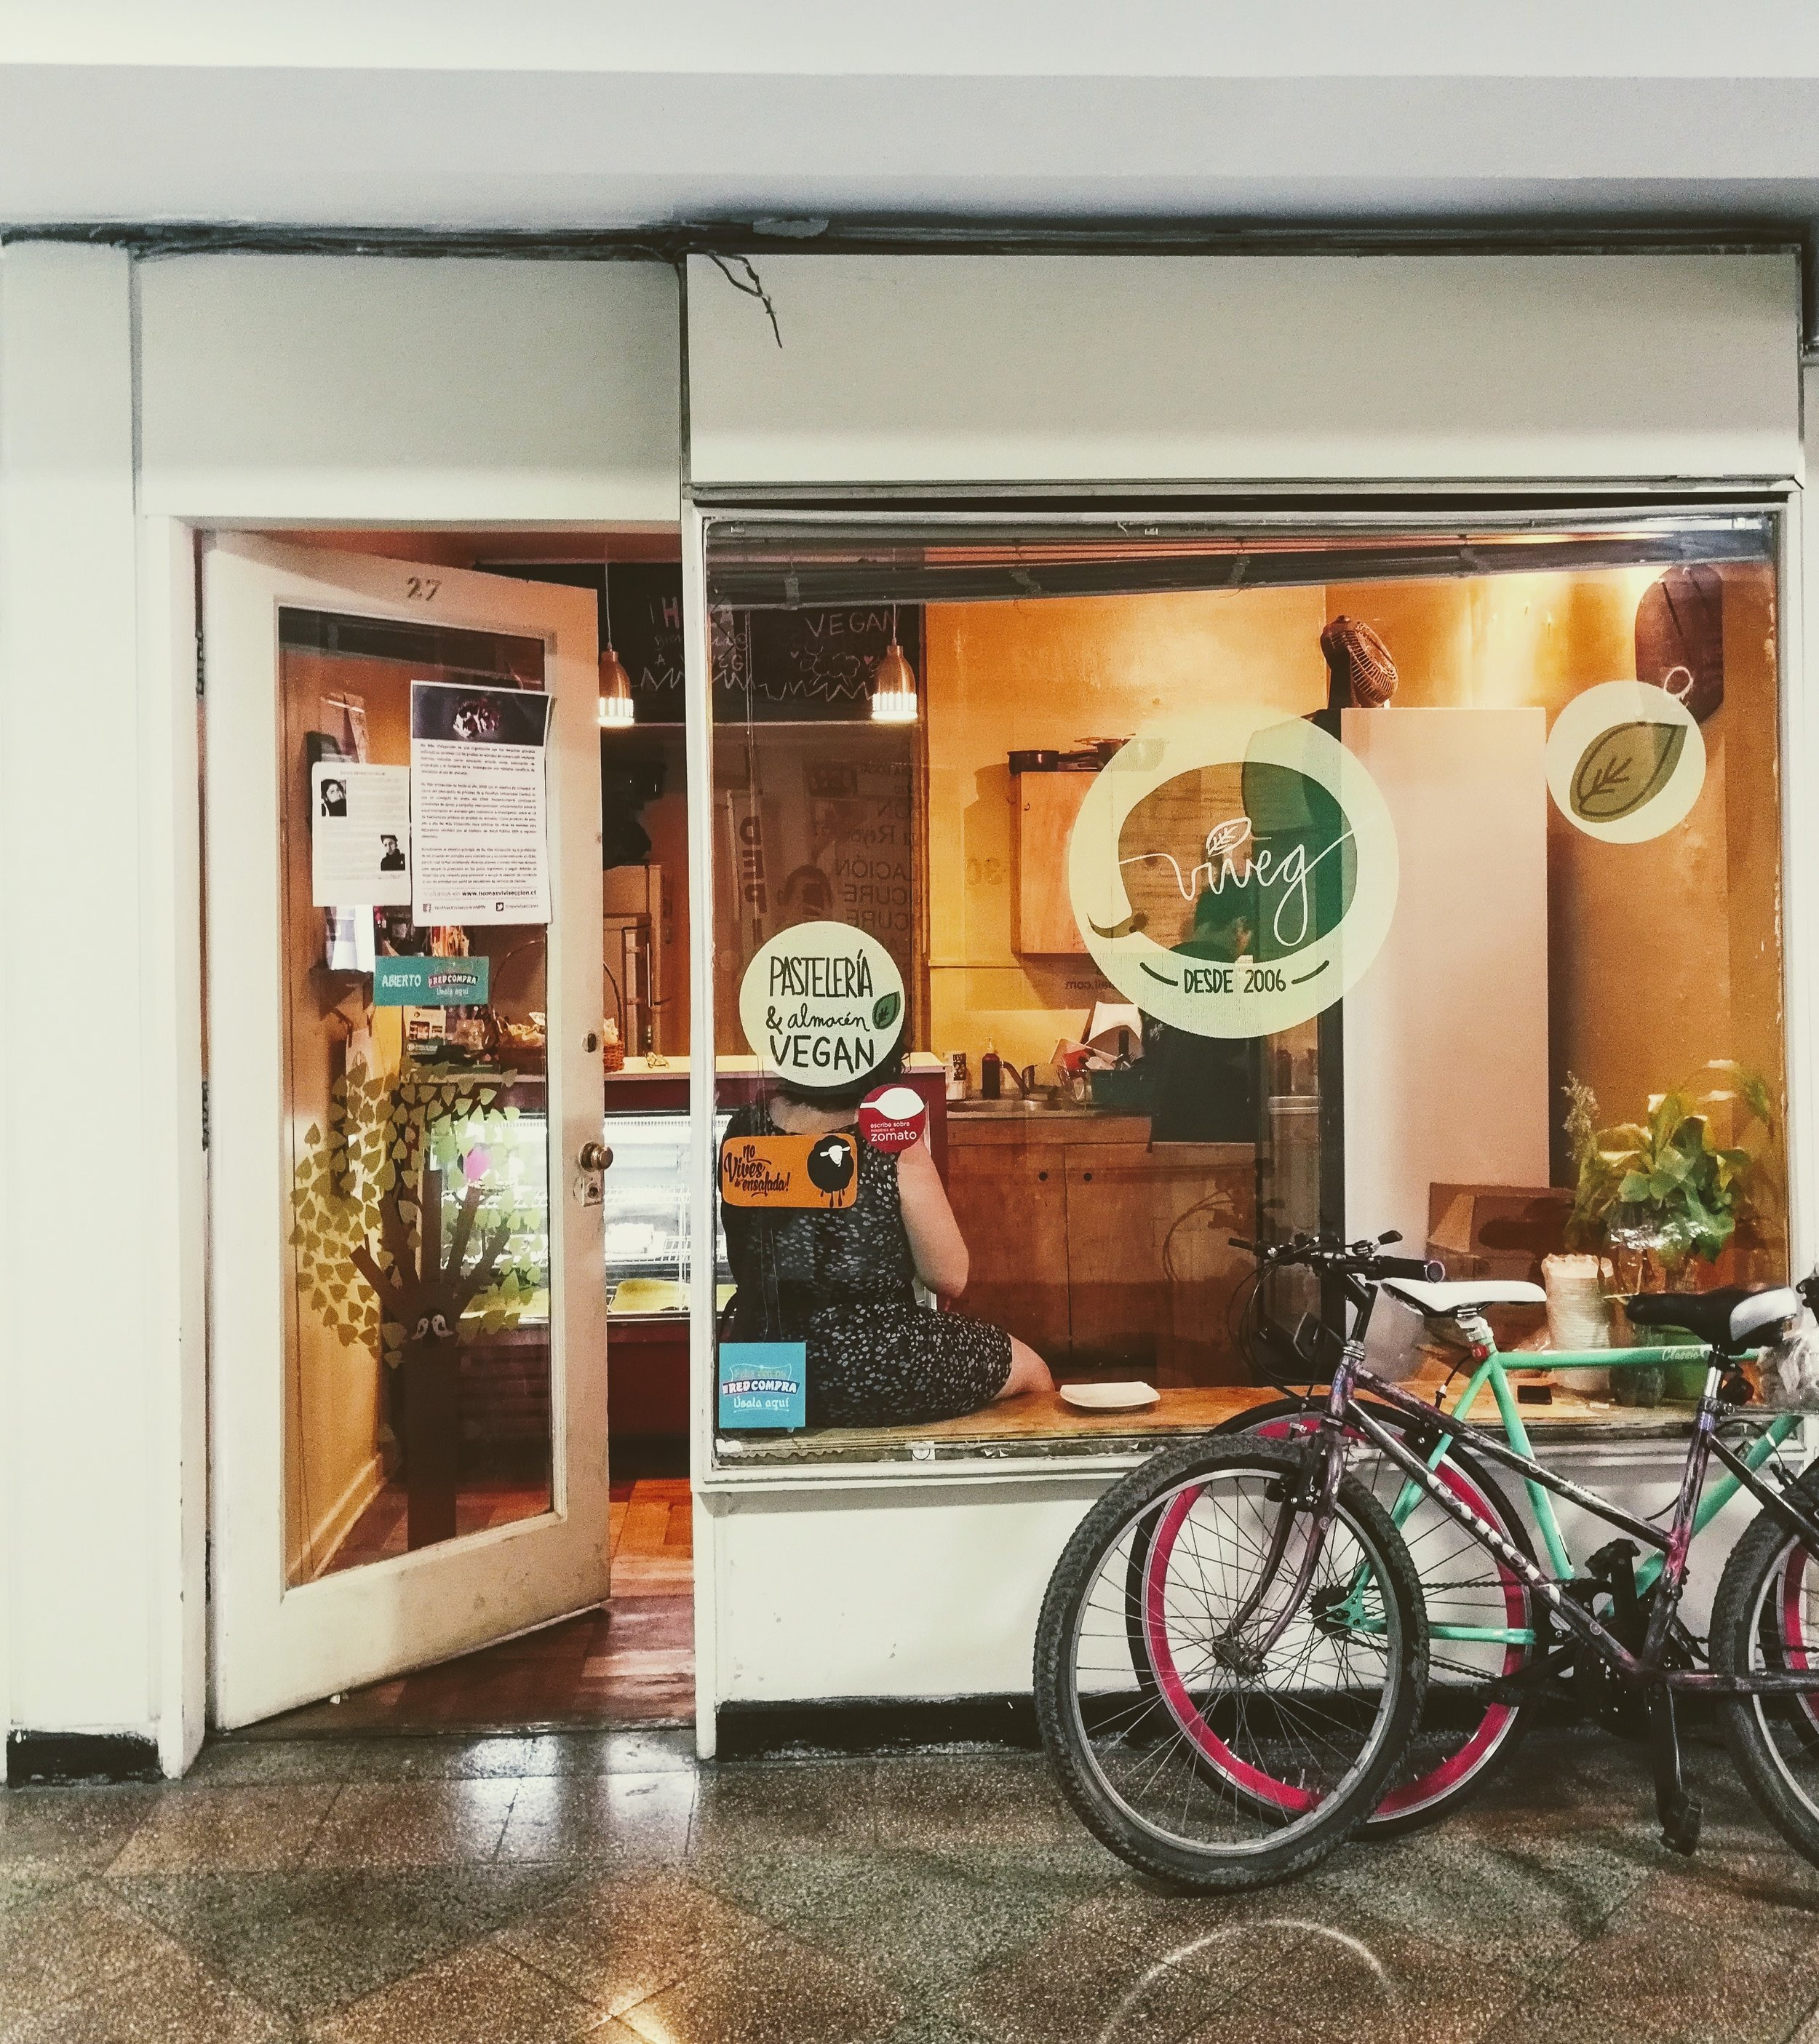 Viveg vegan bakery in the heart of Santiago de Chile. Where to find the best vegan empanada in Santiago.